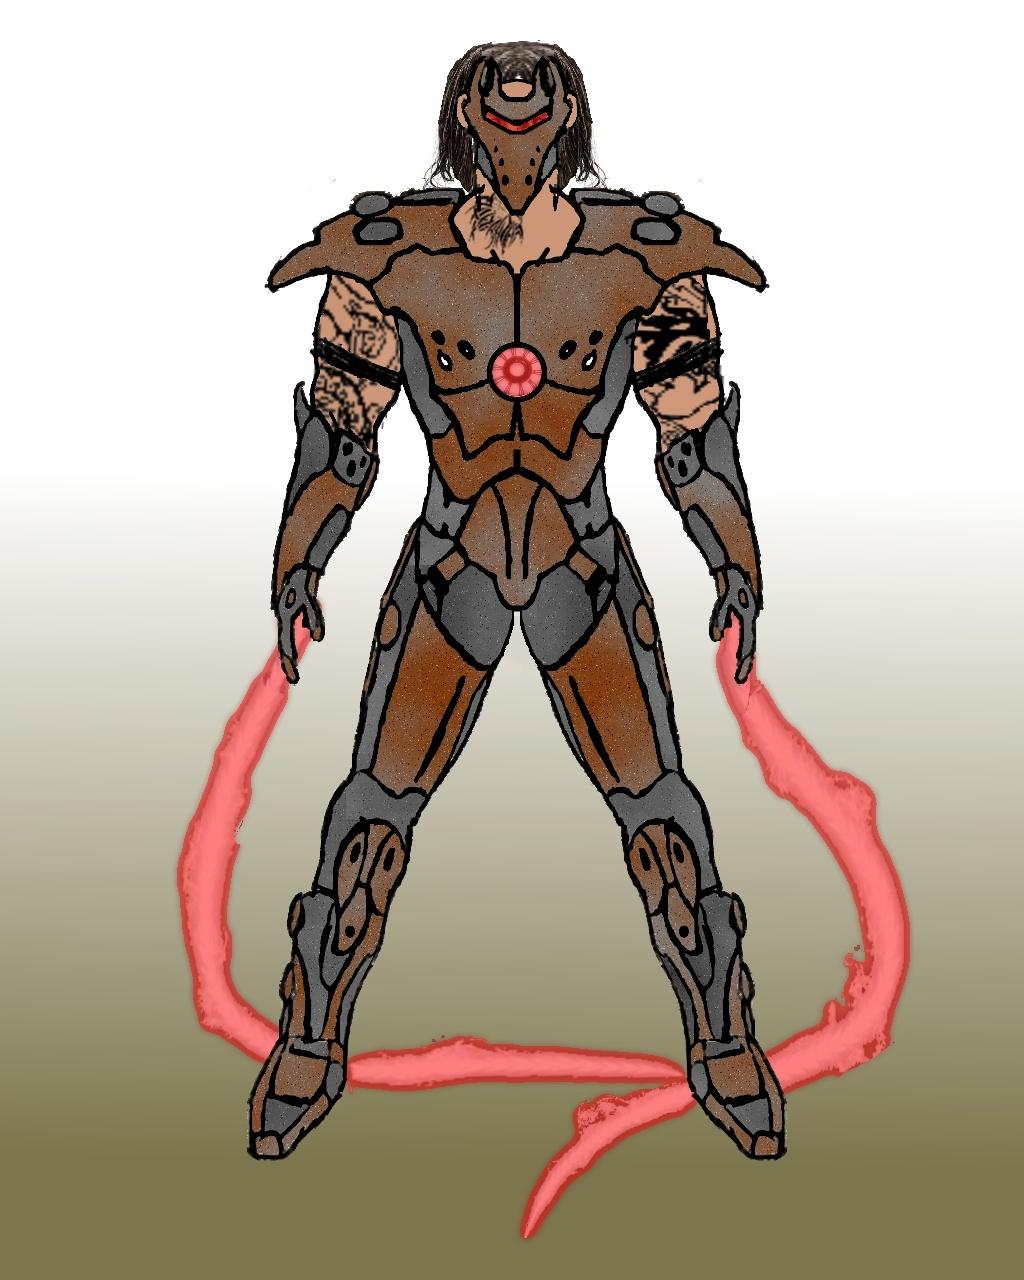 1024x1280 Iron Man 2 Whiplash Fan Art 2 By Marvel Freshman